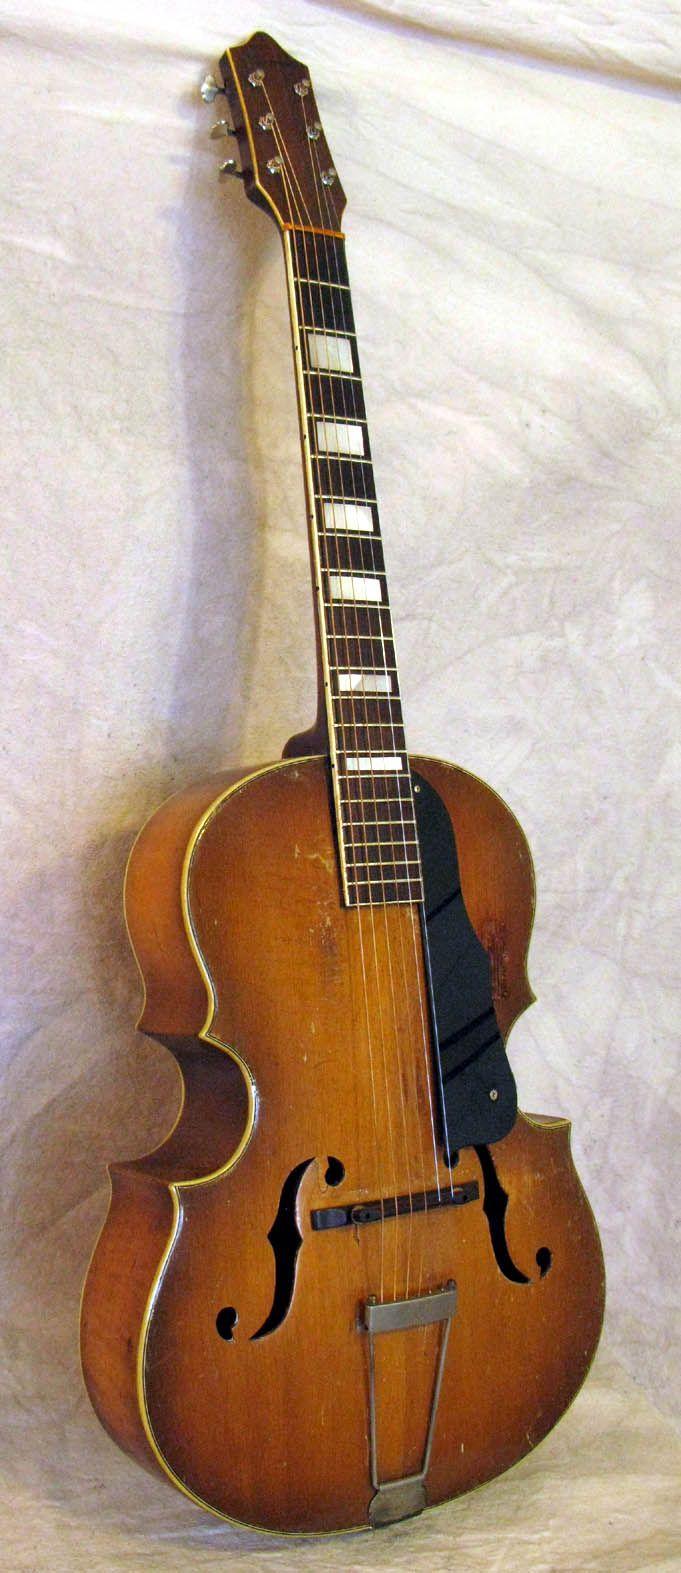 C1936 Sovereign Cello Guitara Very Rare Top Of The Line Archtop